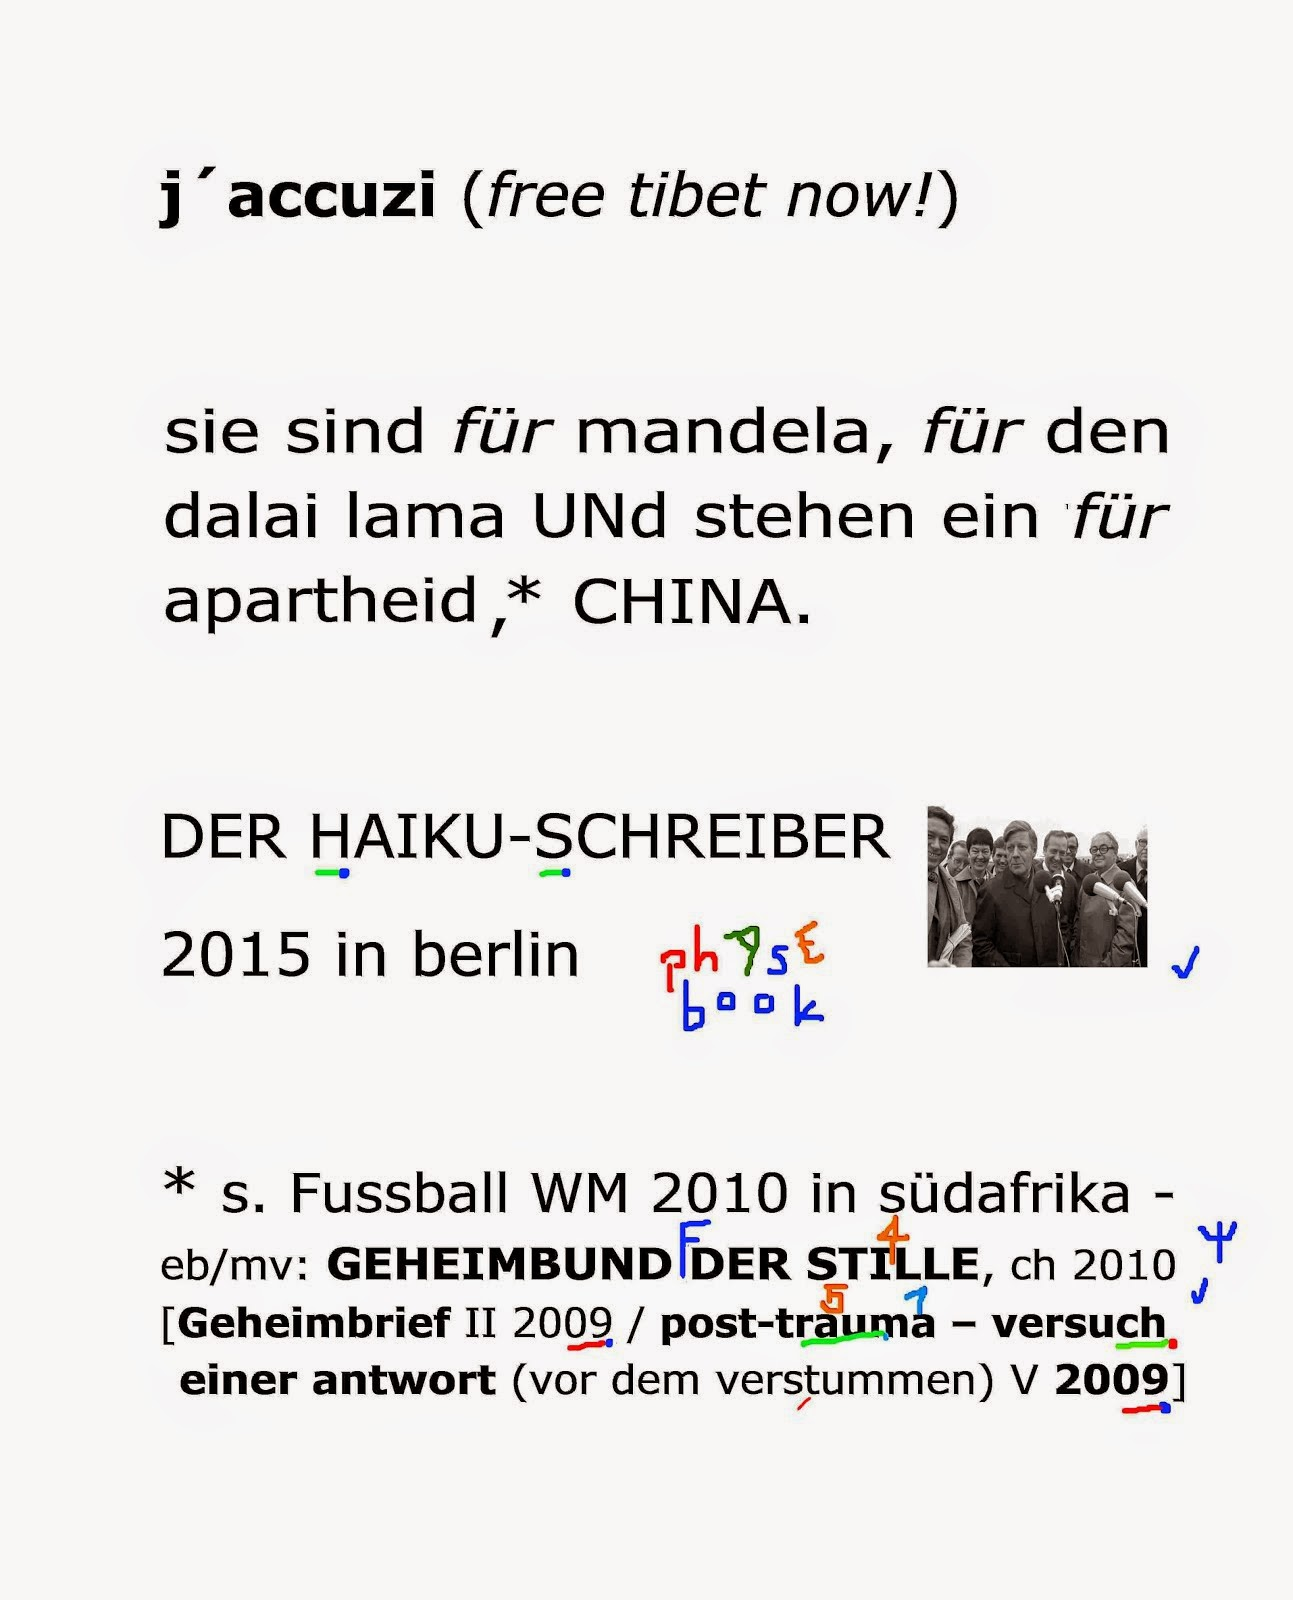 navi pillay NOBEL foundation TMR THE MENTAL REVOLUTION mischa vetere dalai lama nelson mandela FIFA